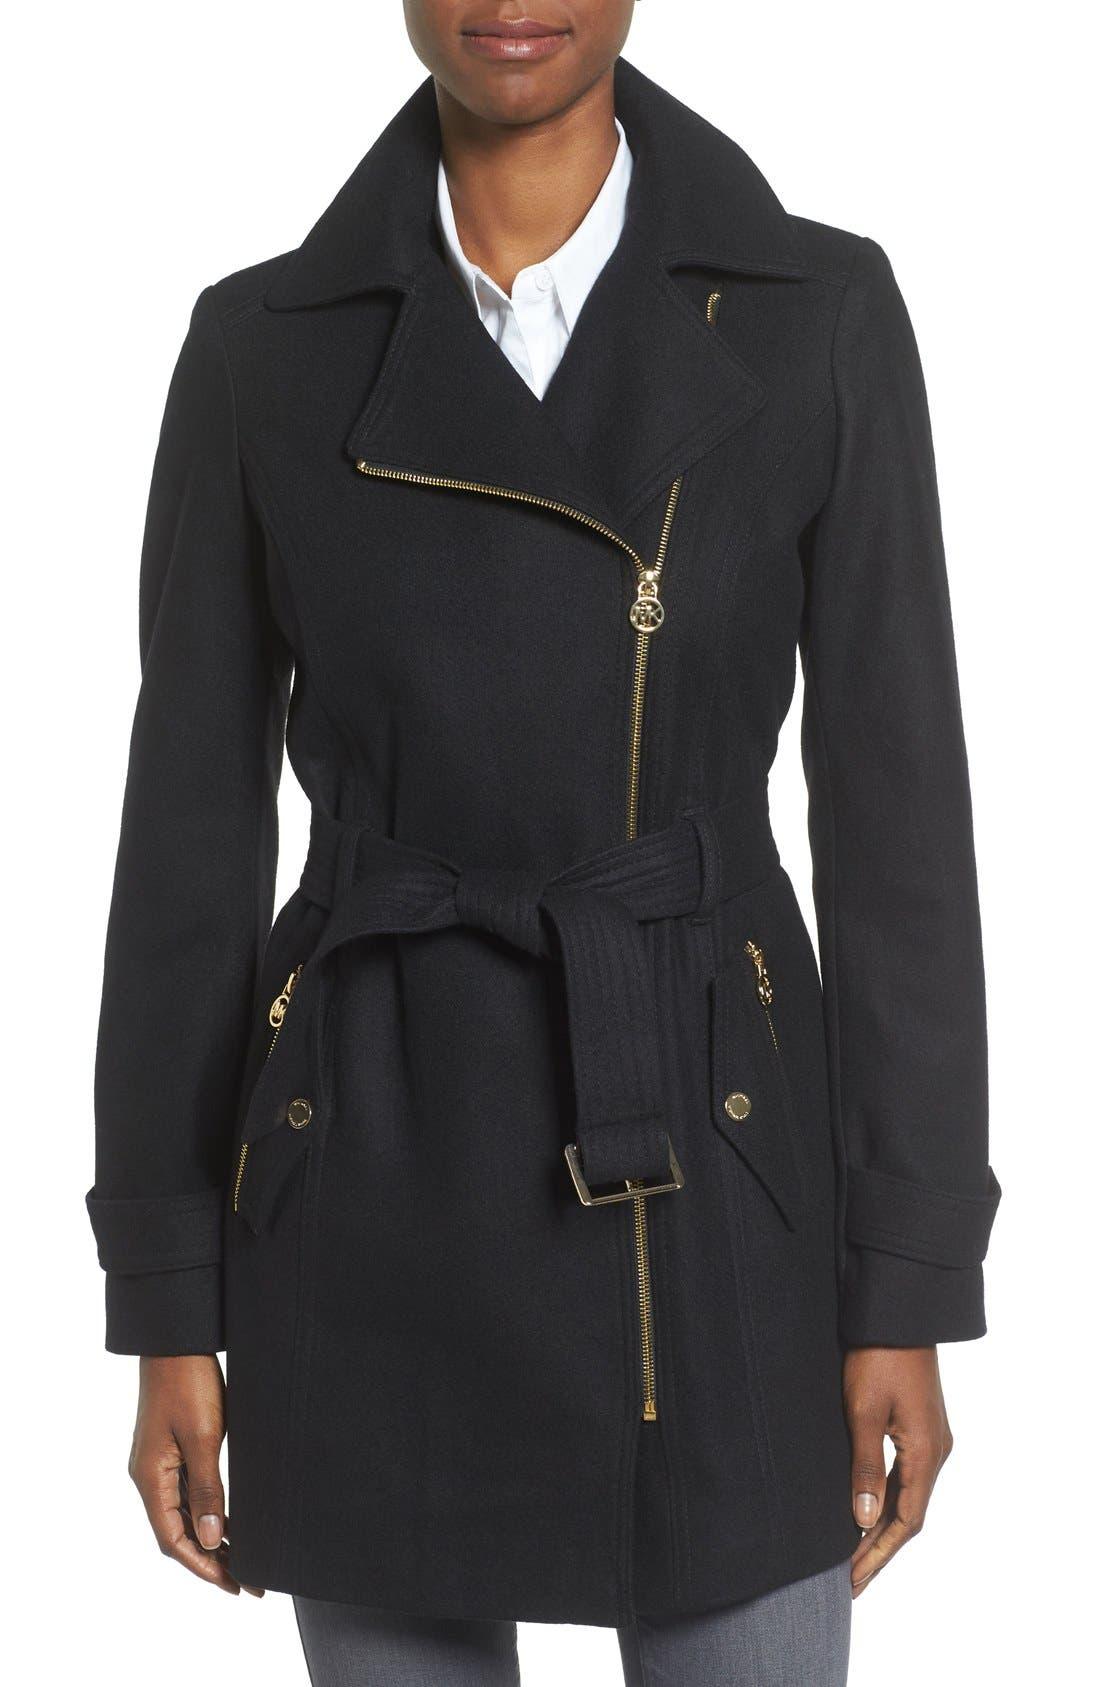 Alternate Image 1 Selected - MICHAEL Michael Kors Belted Asymmetrical Wool Blend Coat